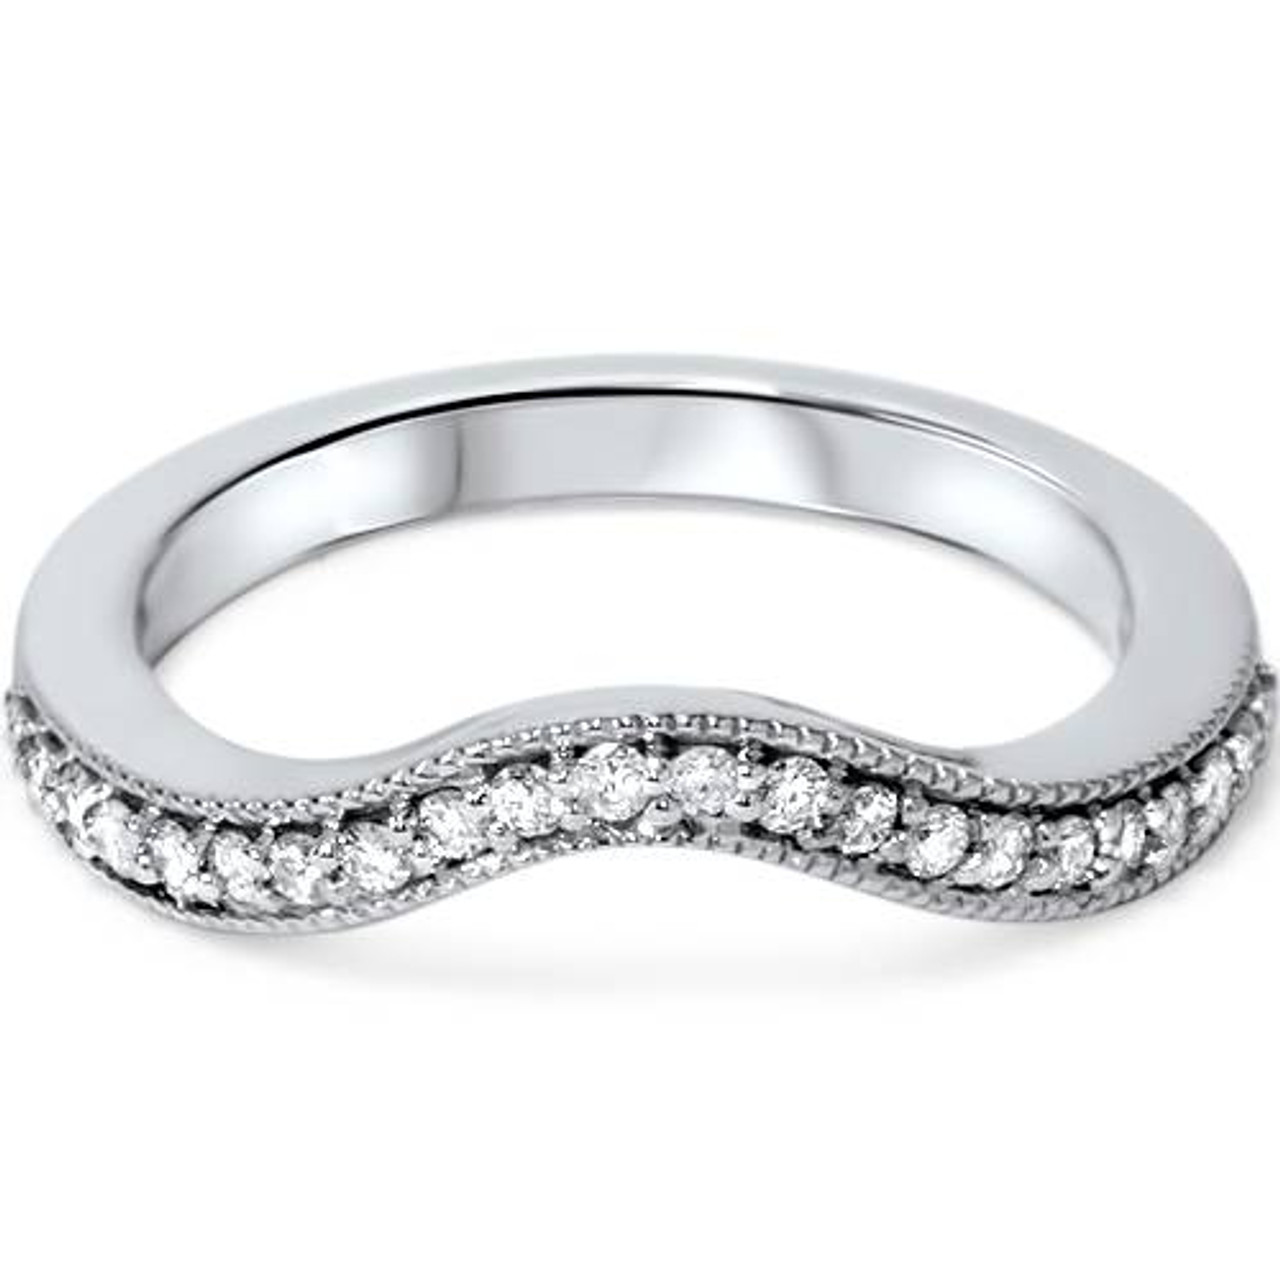 1 5ct Curved Diamond Wedding Band 14k White Gold G H I1 I2